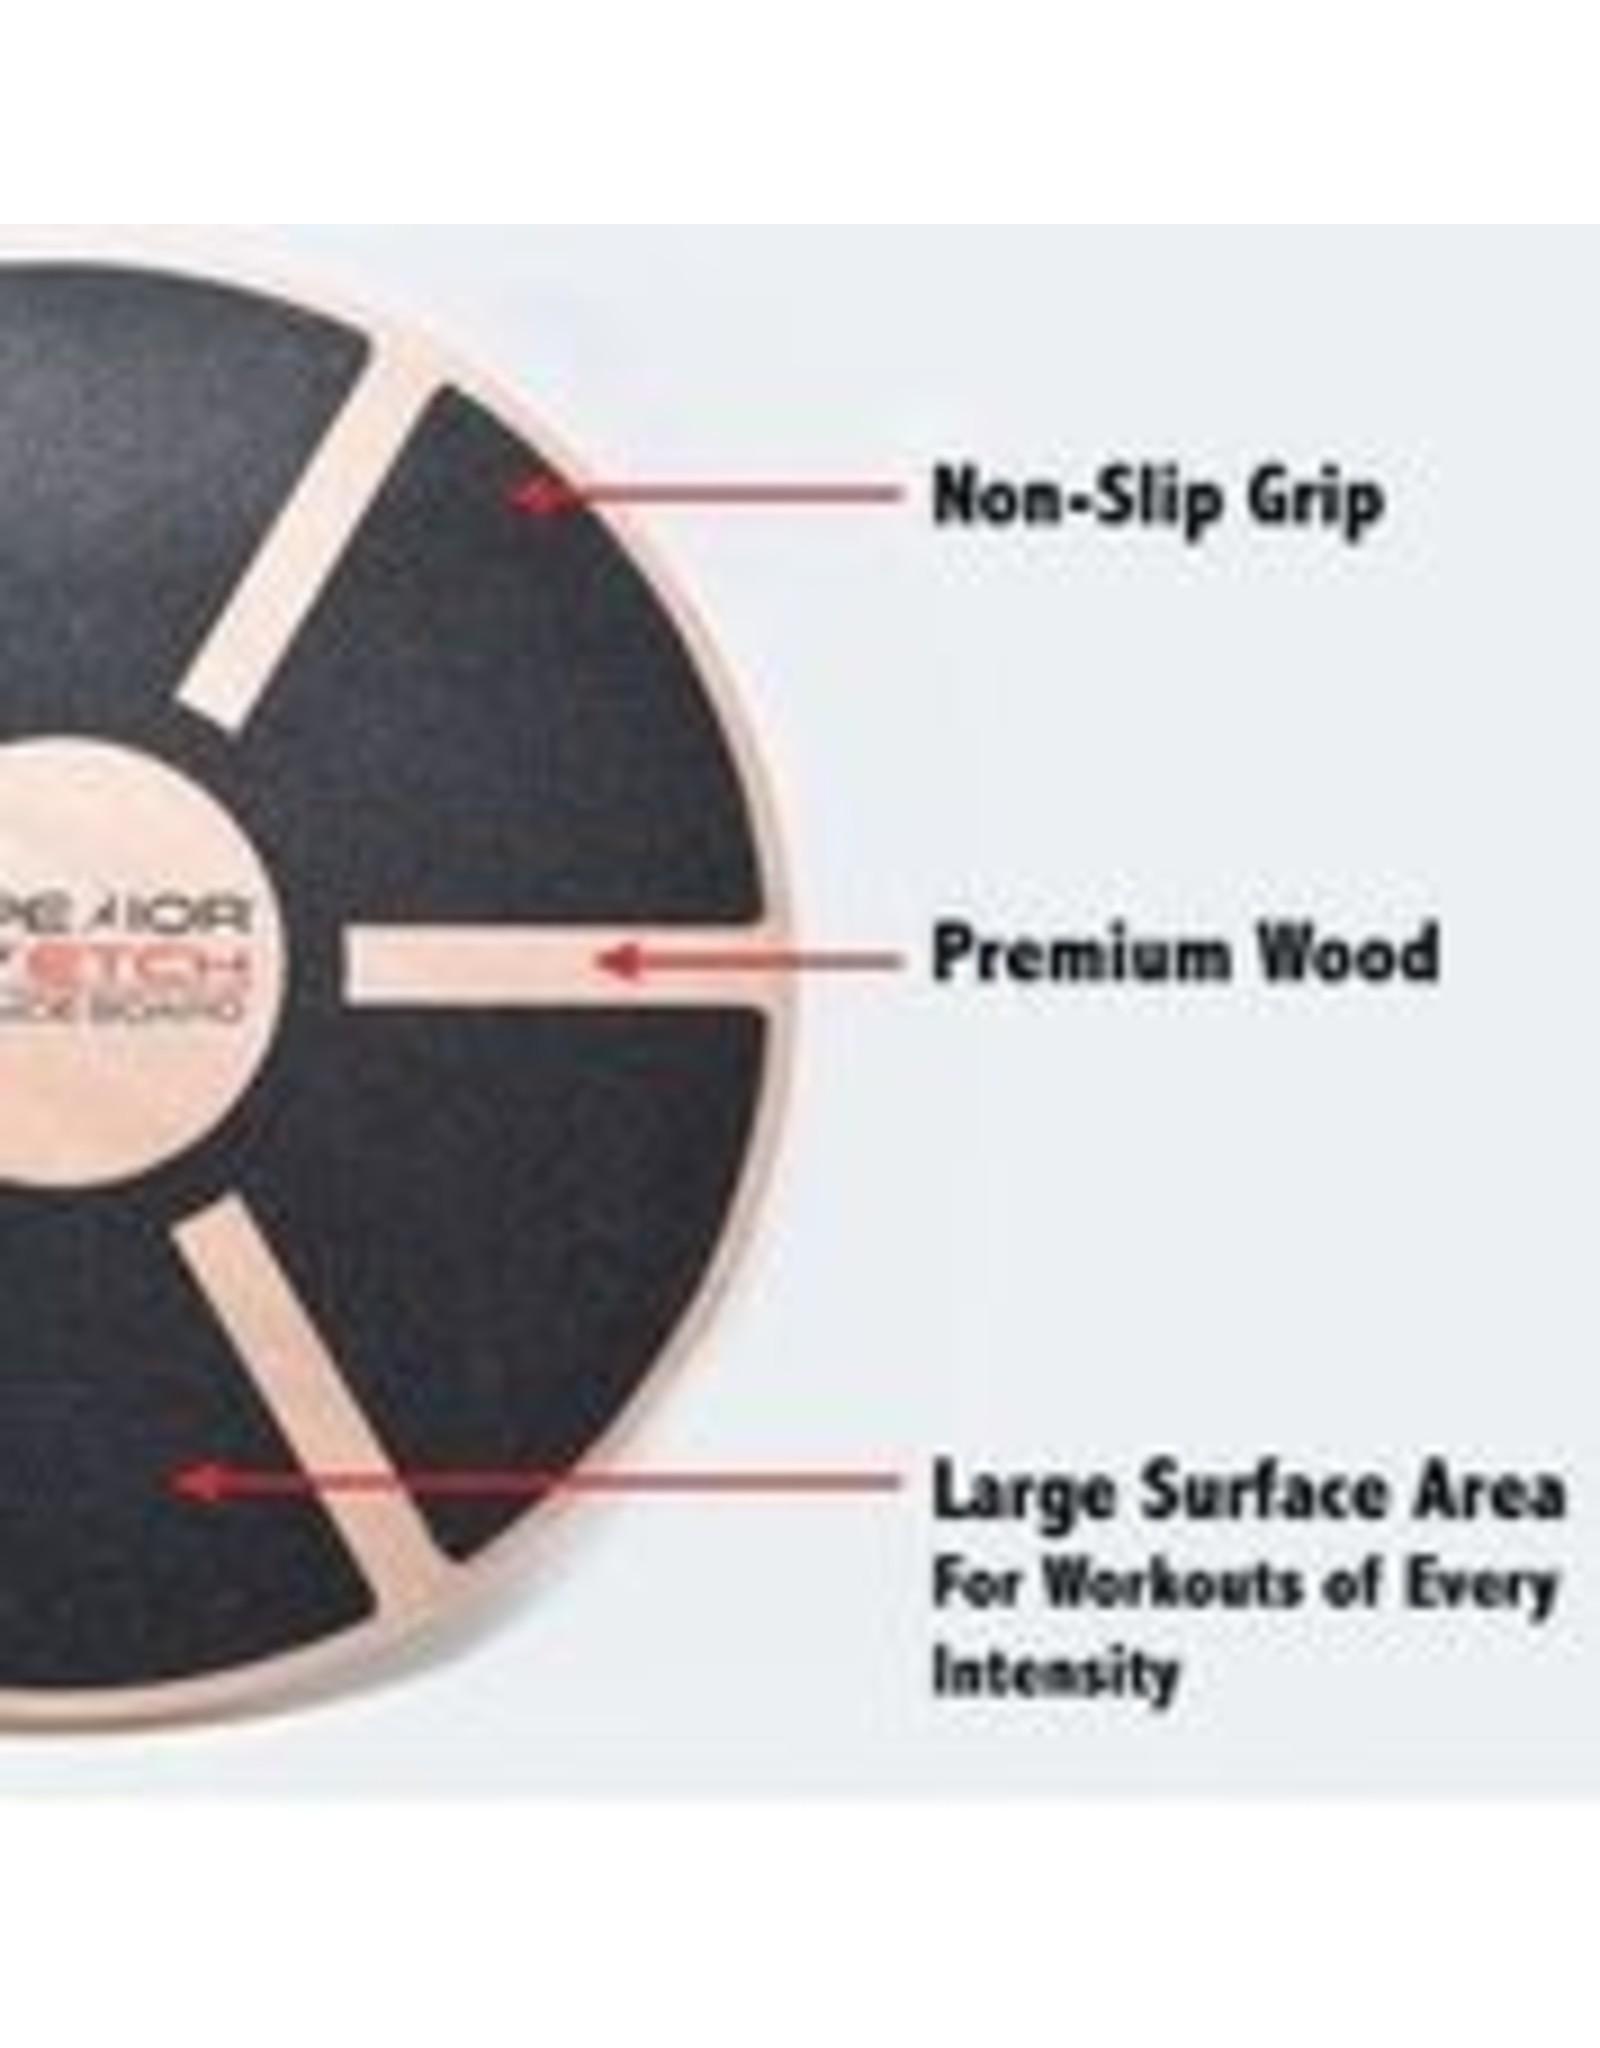 Superior Stretch Round Wood Balance Board